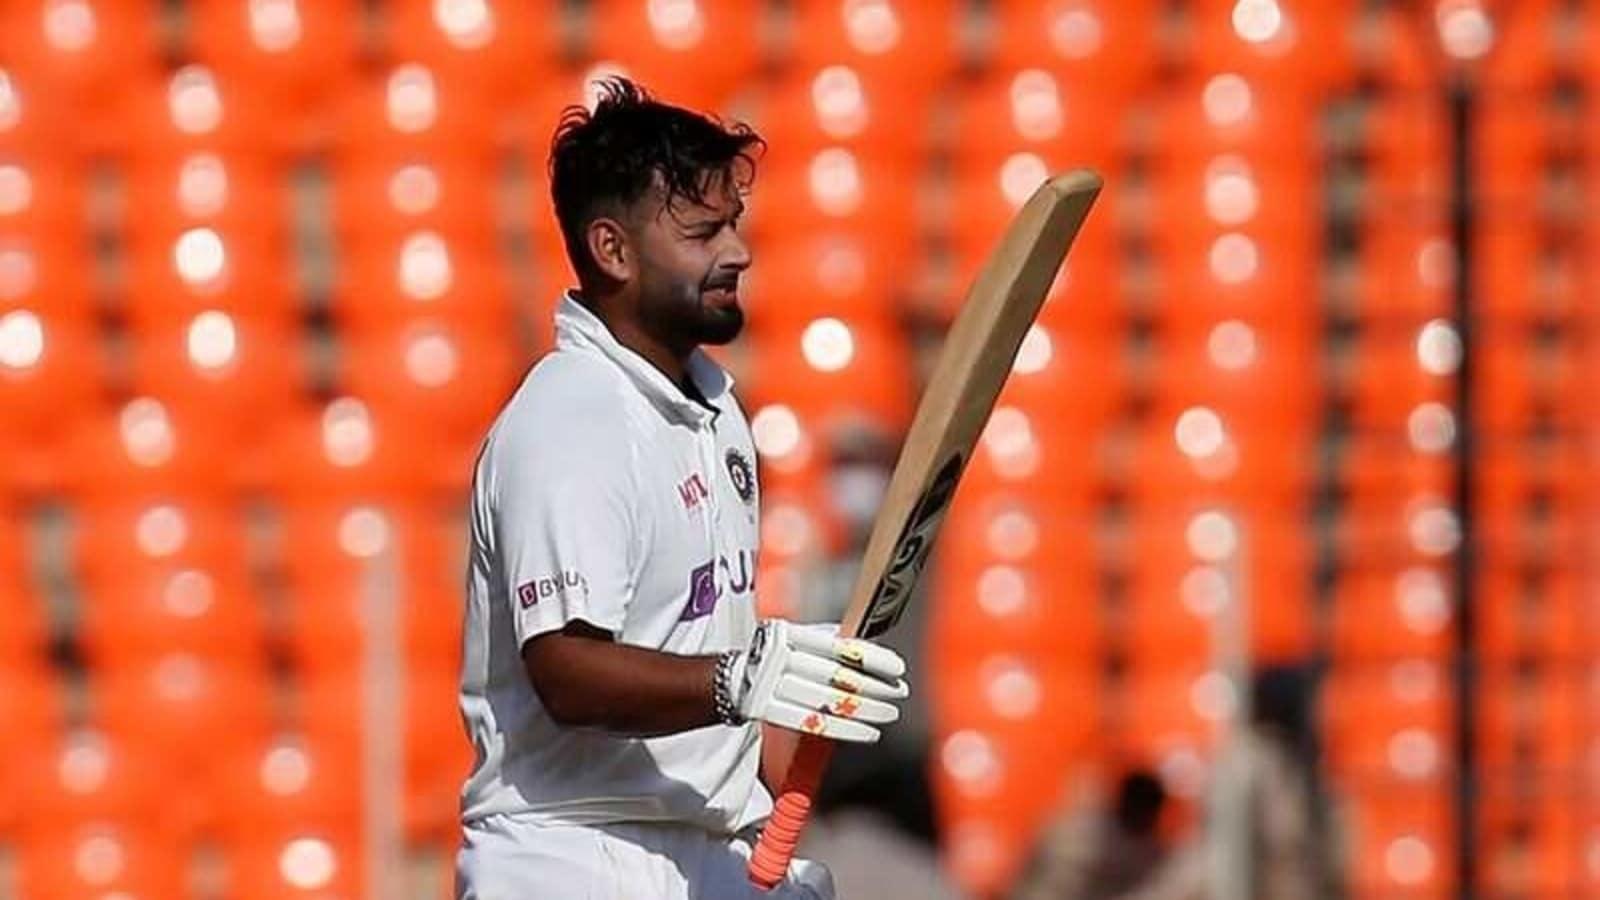 Rishabh Pant achieves career-best Test ranking, R Ashwin No.2, Virat Kohli at lowest points tally since Nov 2017 - Hindustan Times